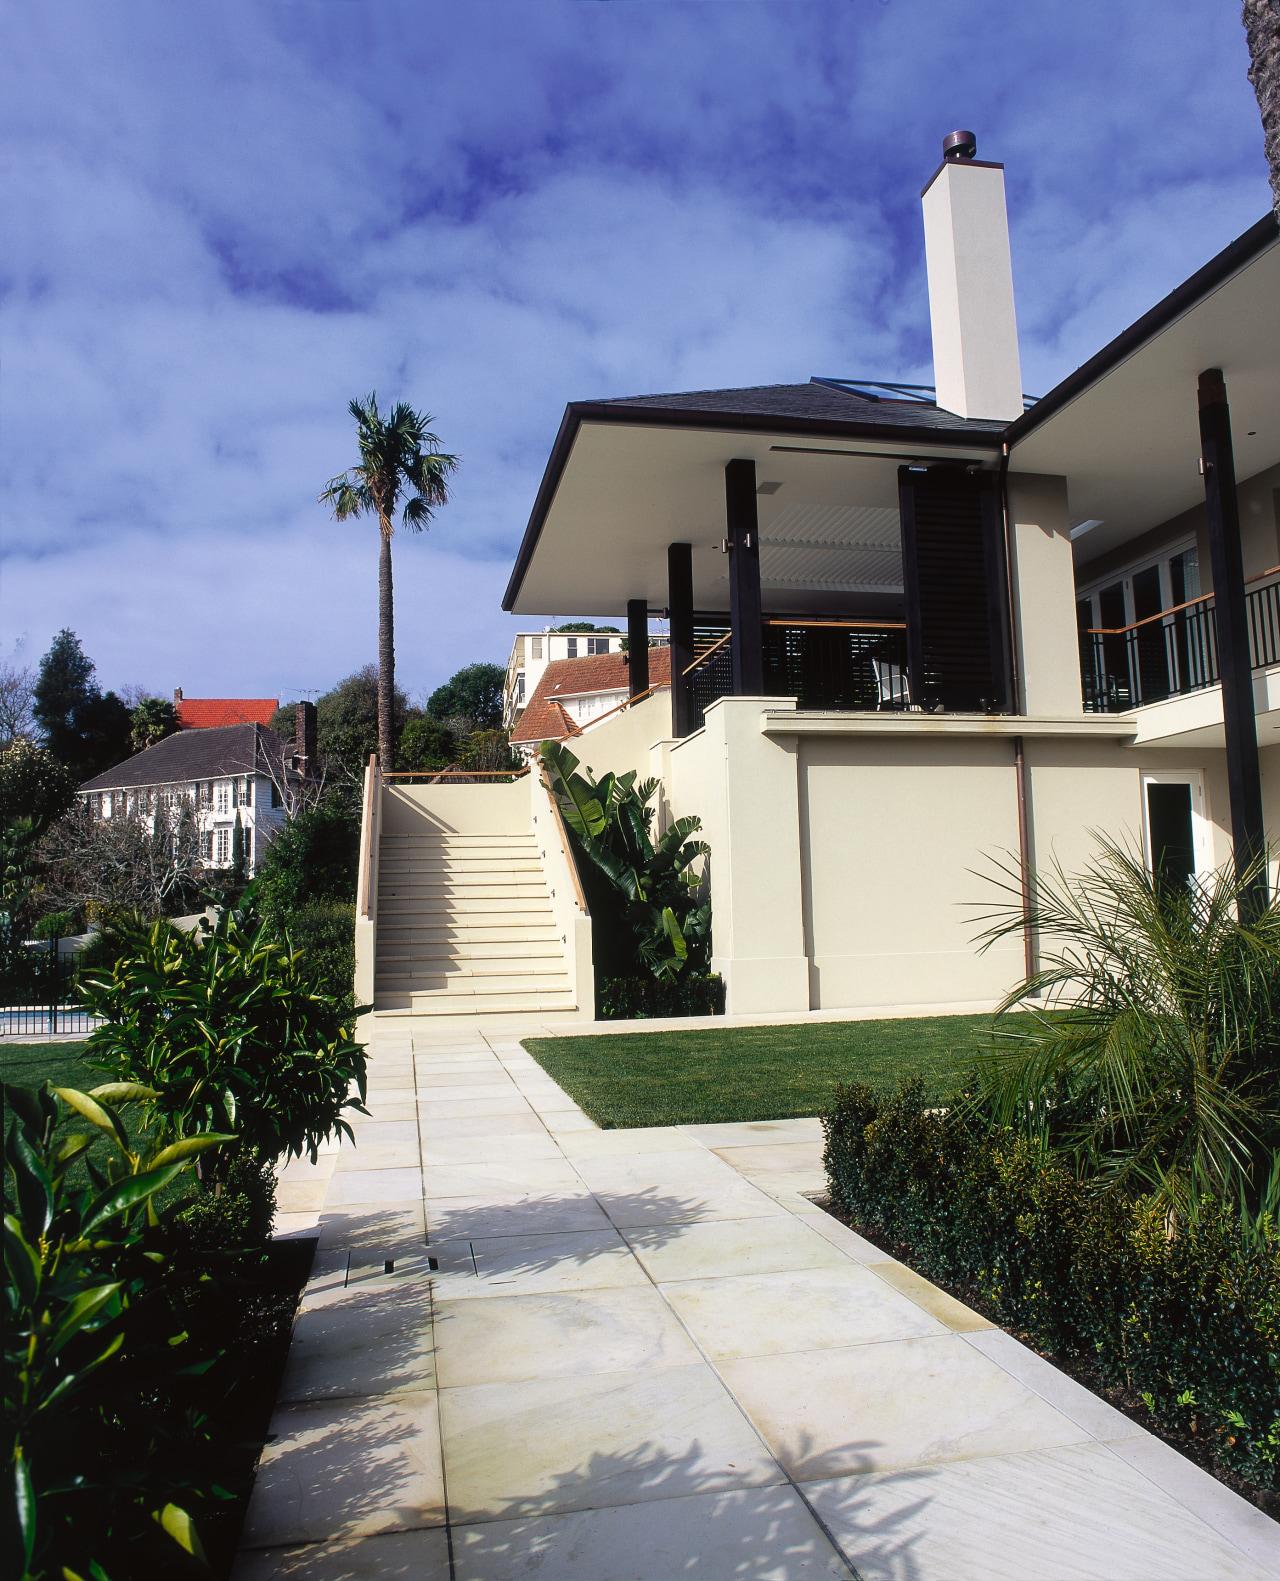 Large cream sandstone tiles surround a front garden architecture, building, cottage, estate, facade, home, house, property, real estate, residential area, sky, villa, blue